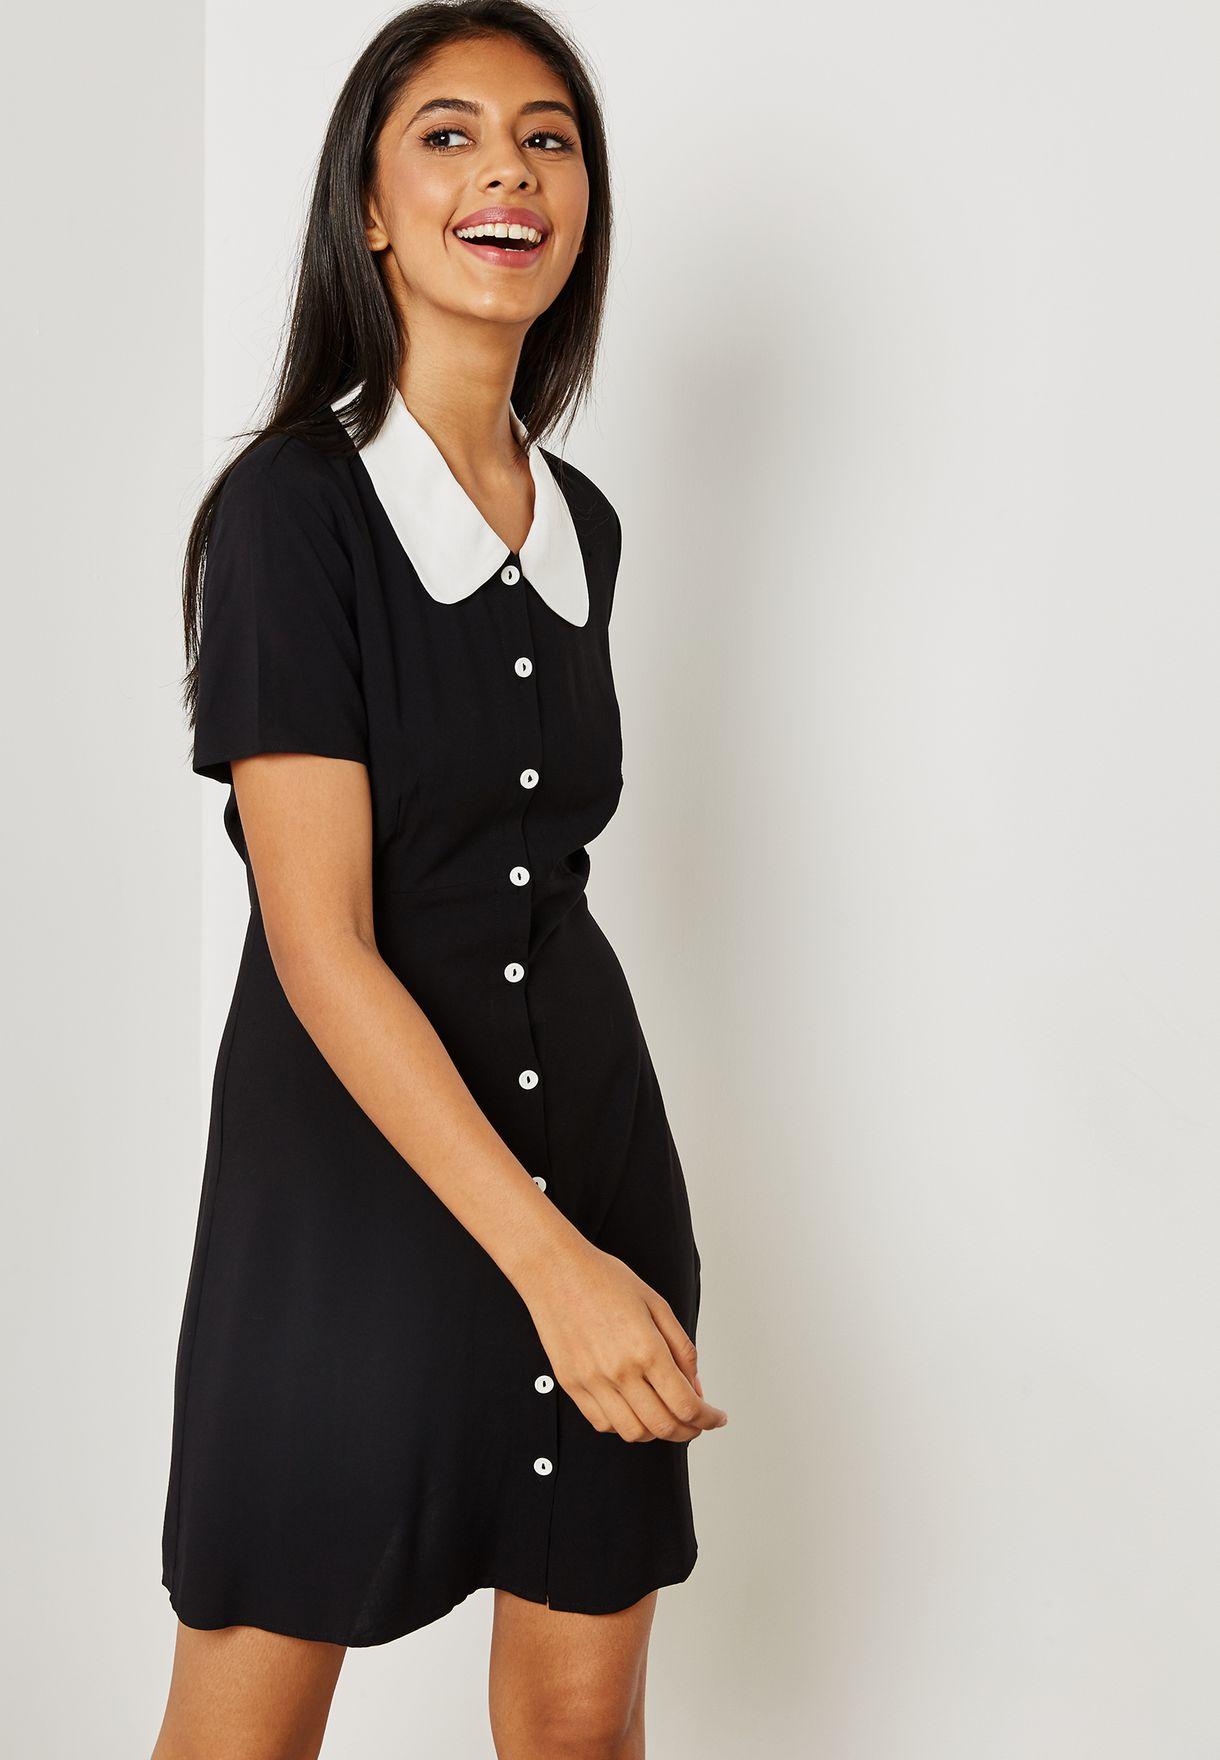 b411c03d415 Shop Forever 21 black Button Detail Shirt Dress 283852 for Women in ...